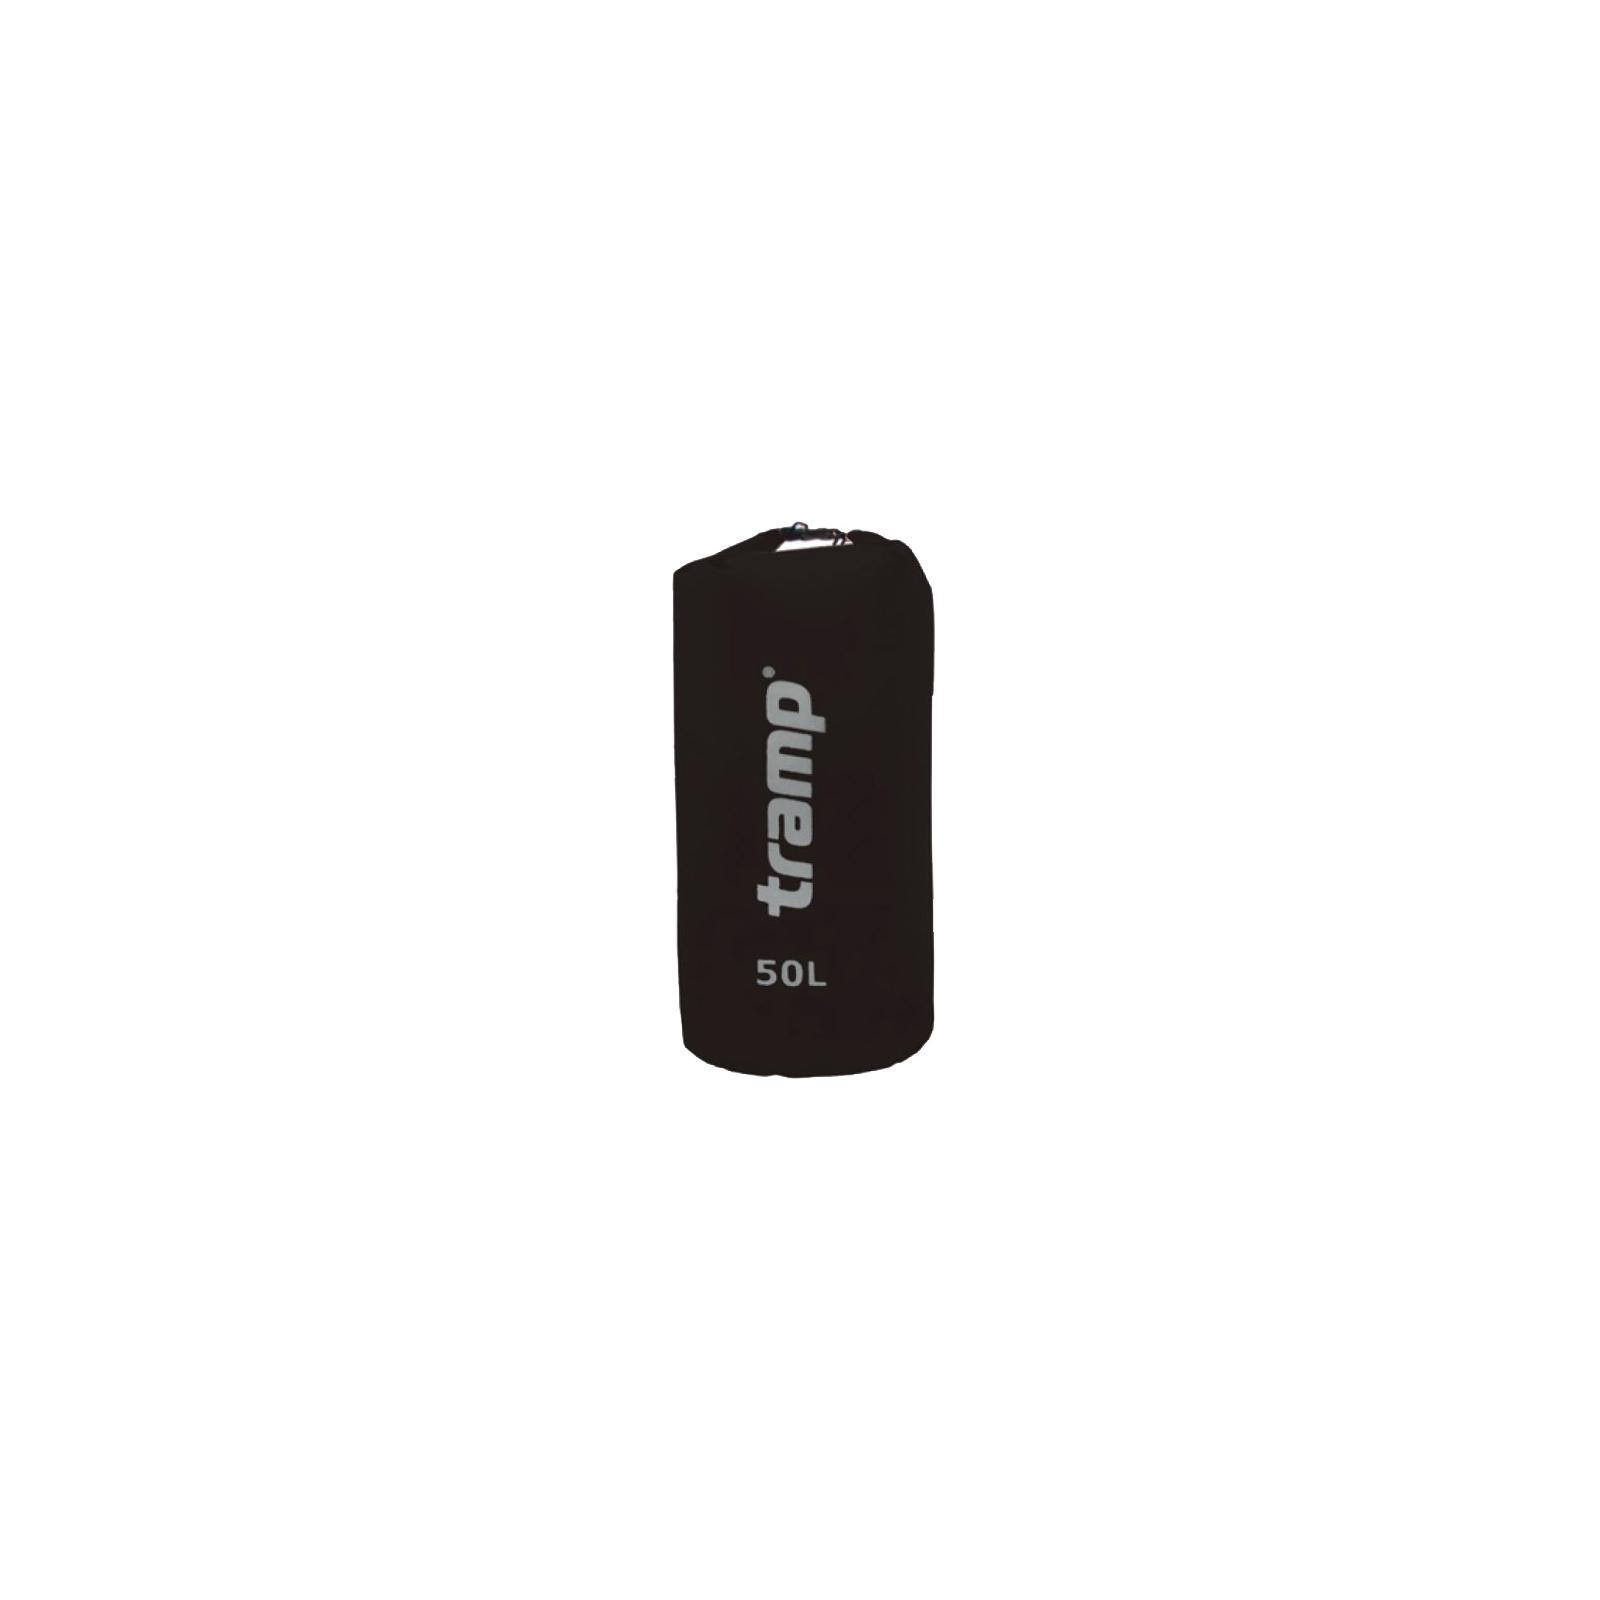 Гермомешок Tramp Nylon PVC 50 черный (TRA-103 black)